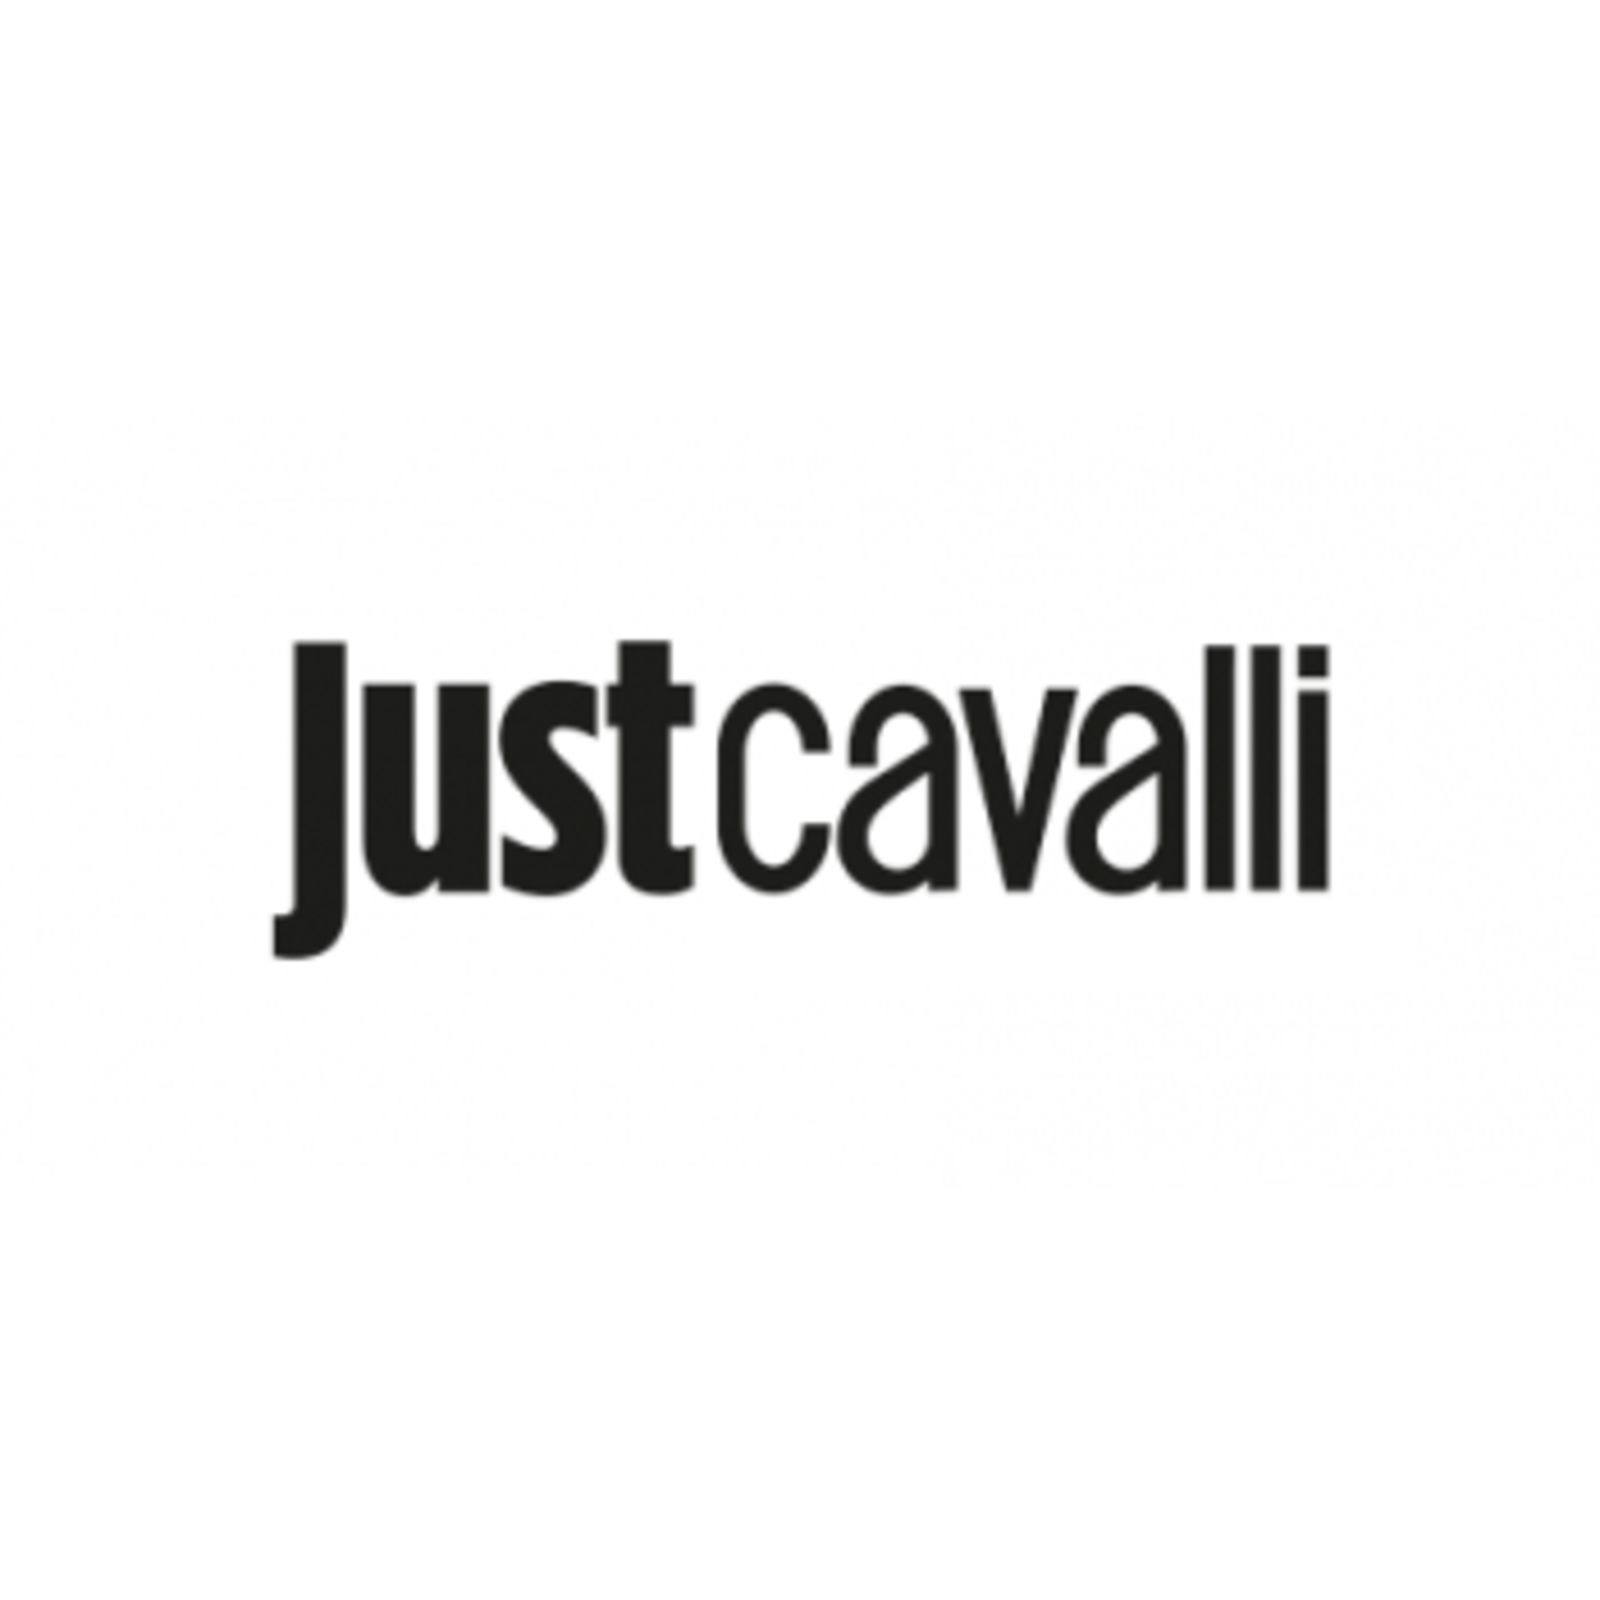 Just Cavalli (Image 1)